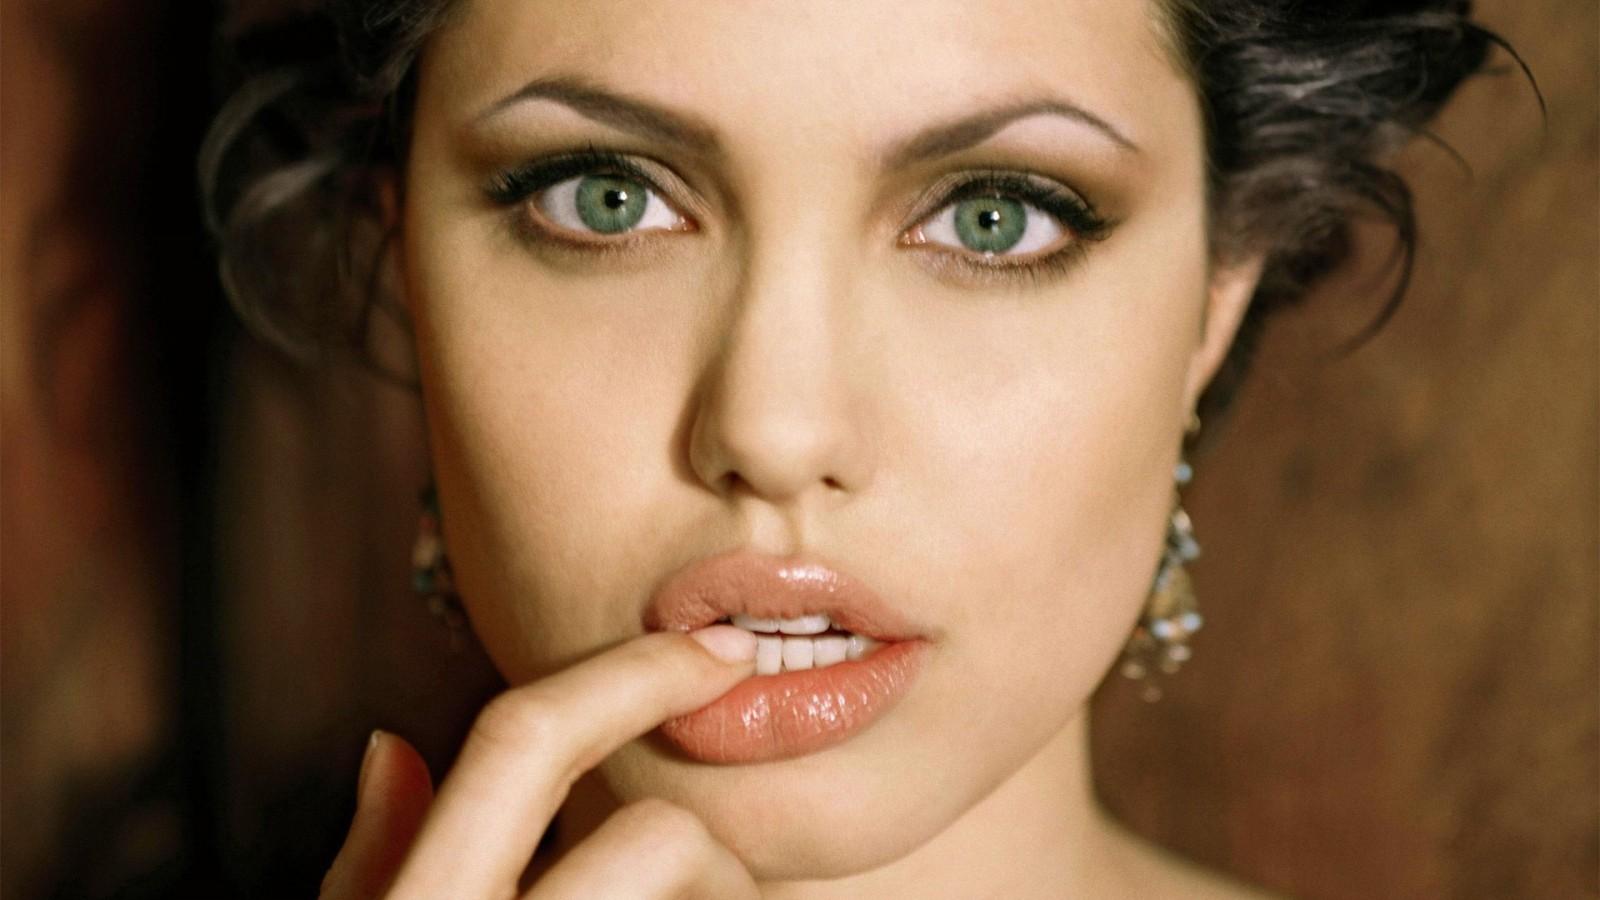 http://1.bp.blogspot.com/-l0tAm7g6Llg/UZOLJgB8snI/AAAAAAAAHGk/gaB1Fm3Vv20/s1600/Angelina-Jolie-2013-HD-Wallpaper.jpg